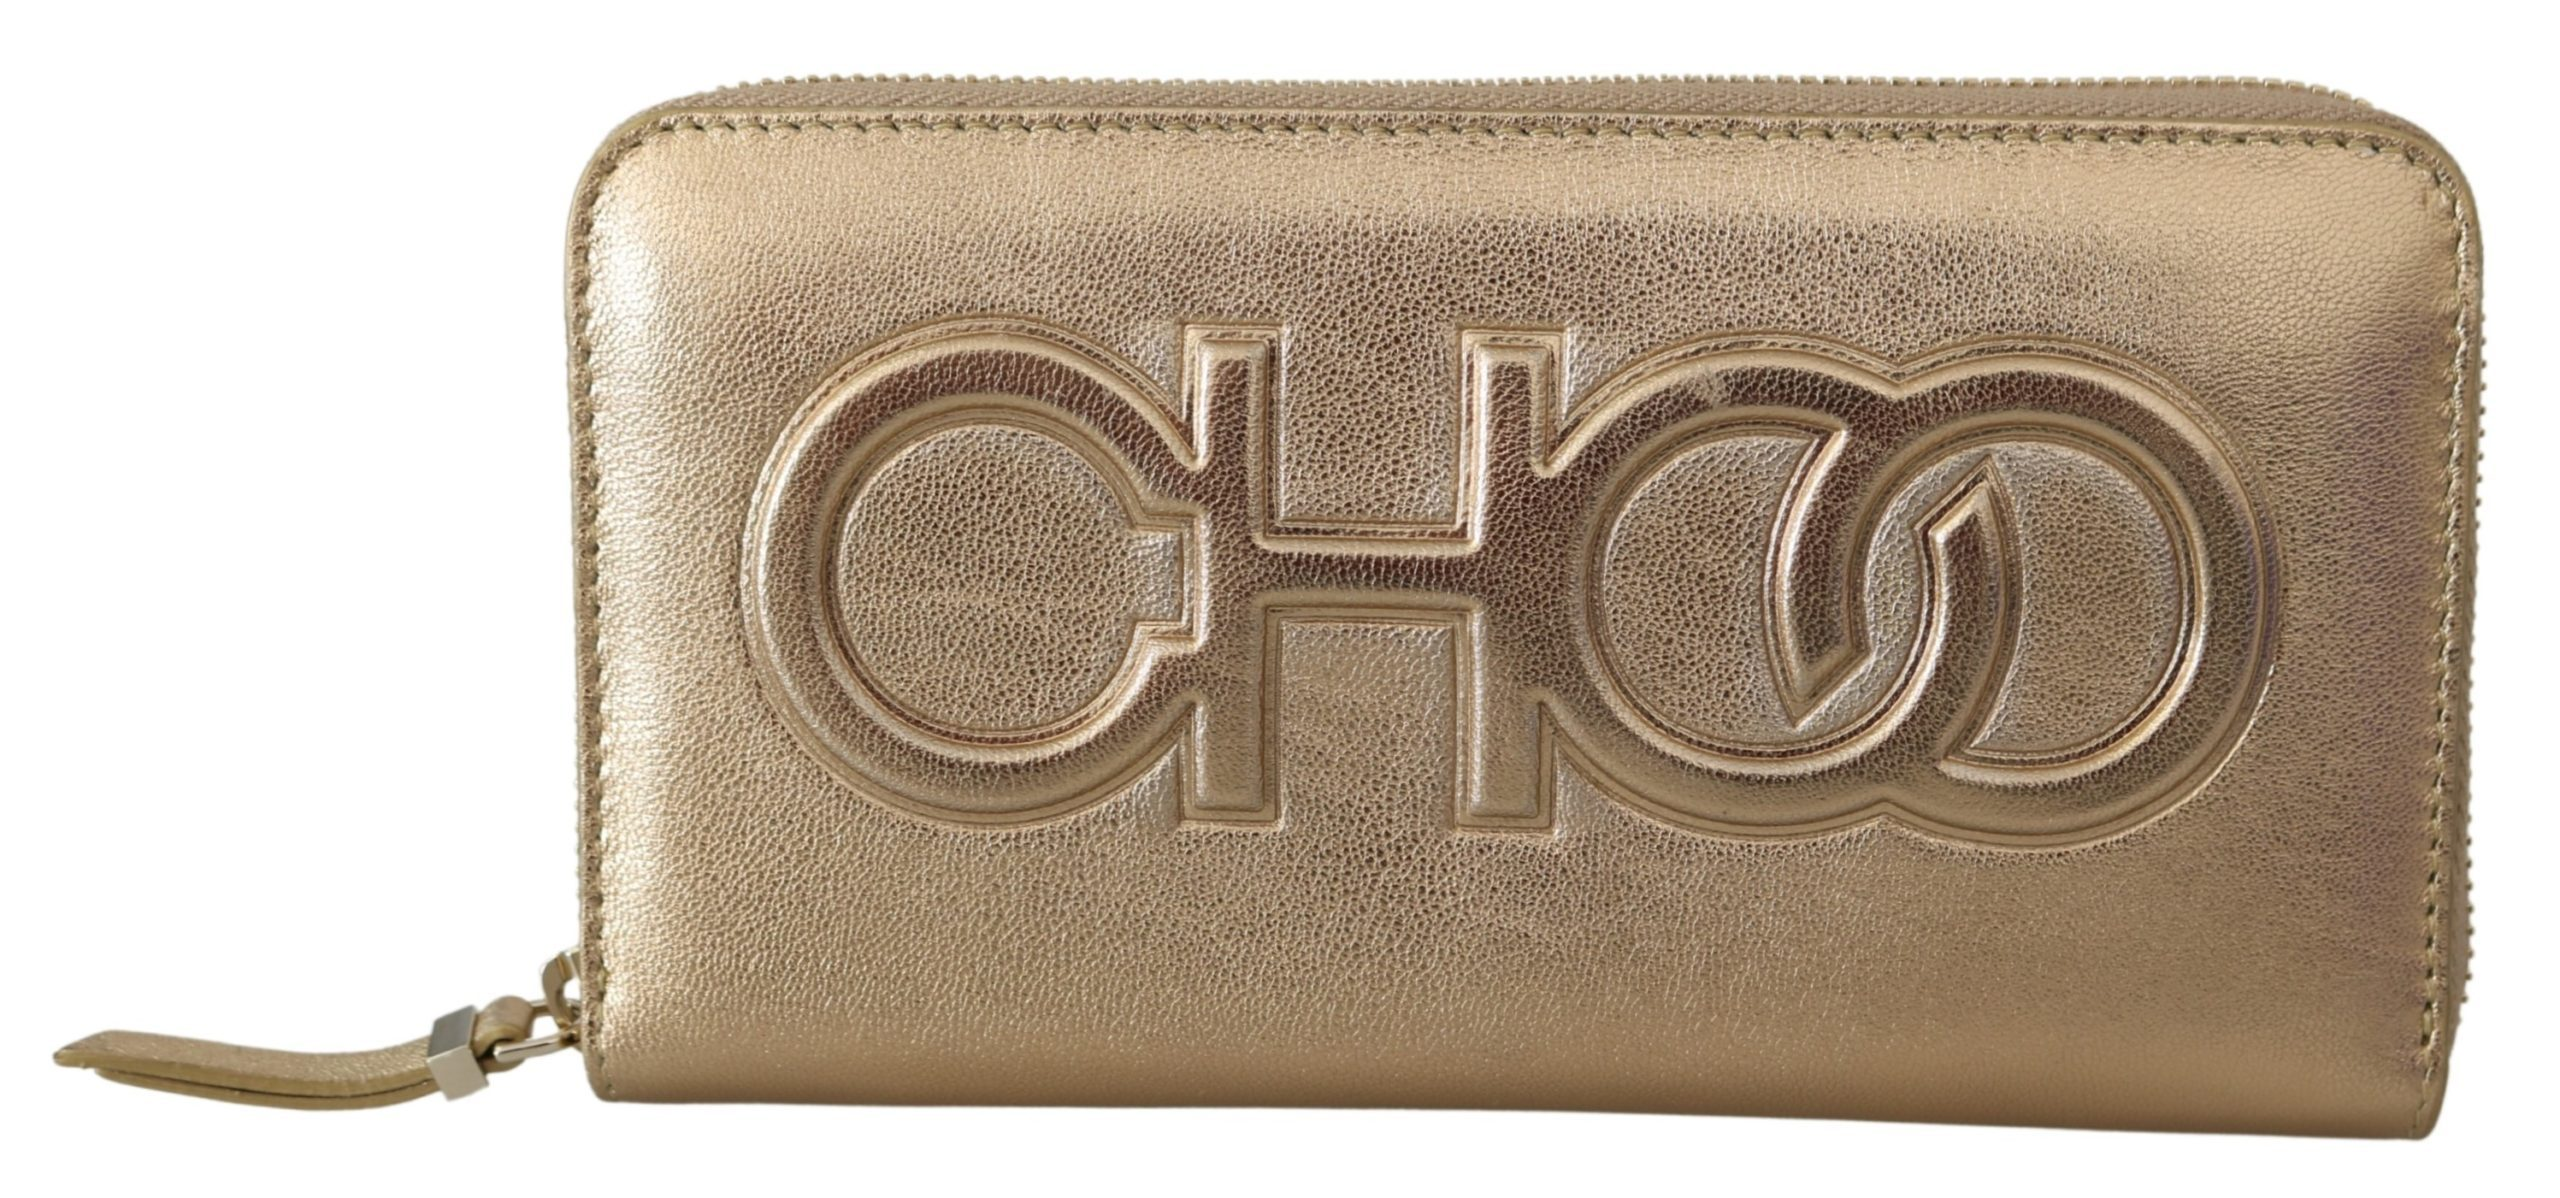 Jimmy Choo Women's Bettina Wallet Gold 1436101